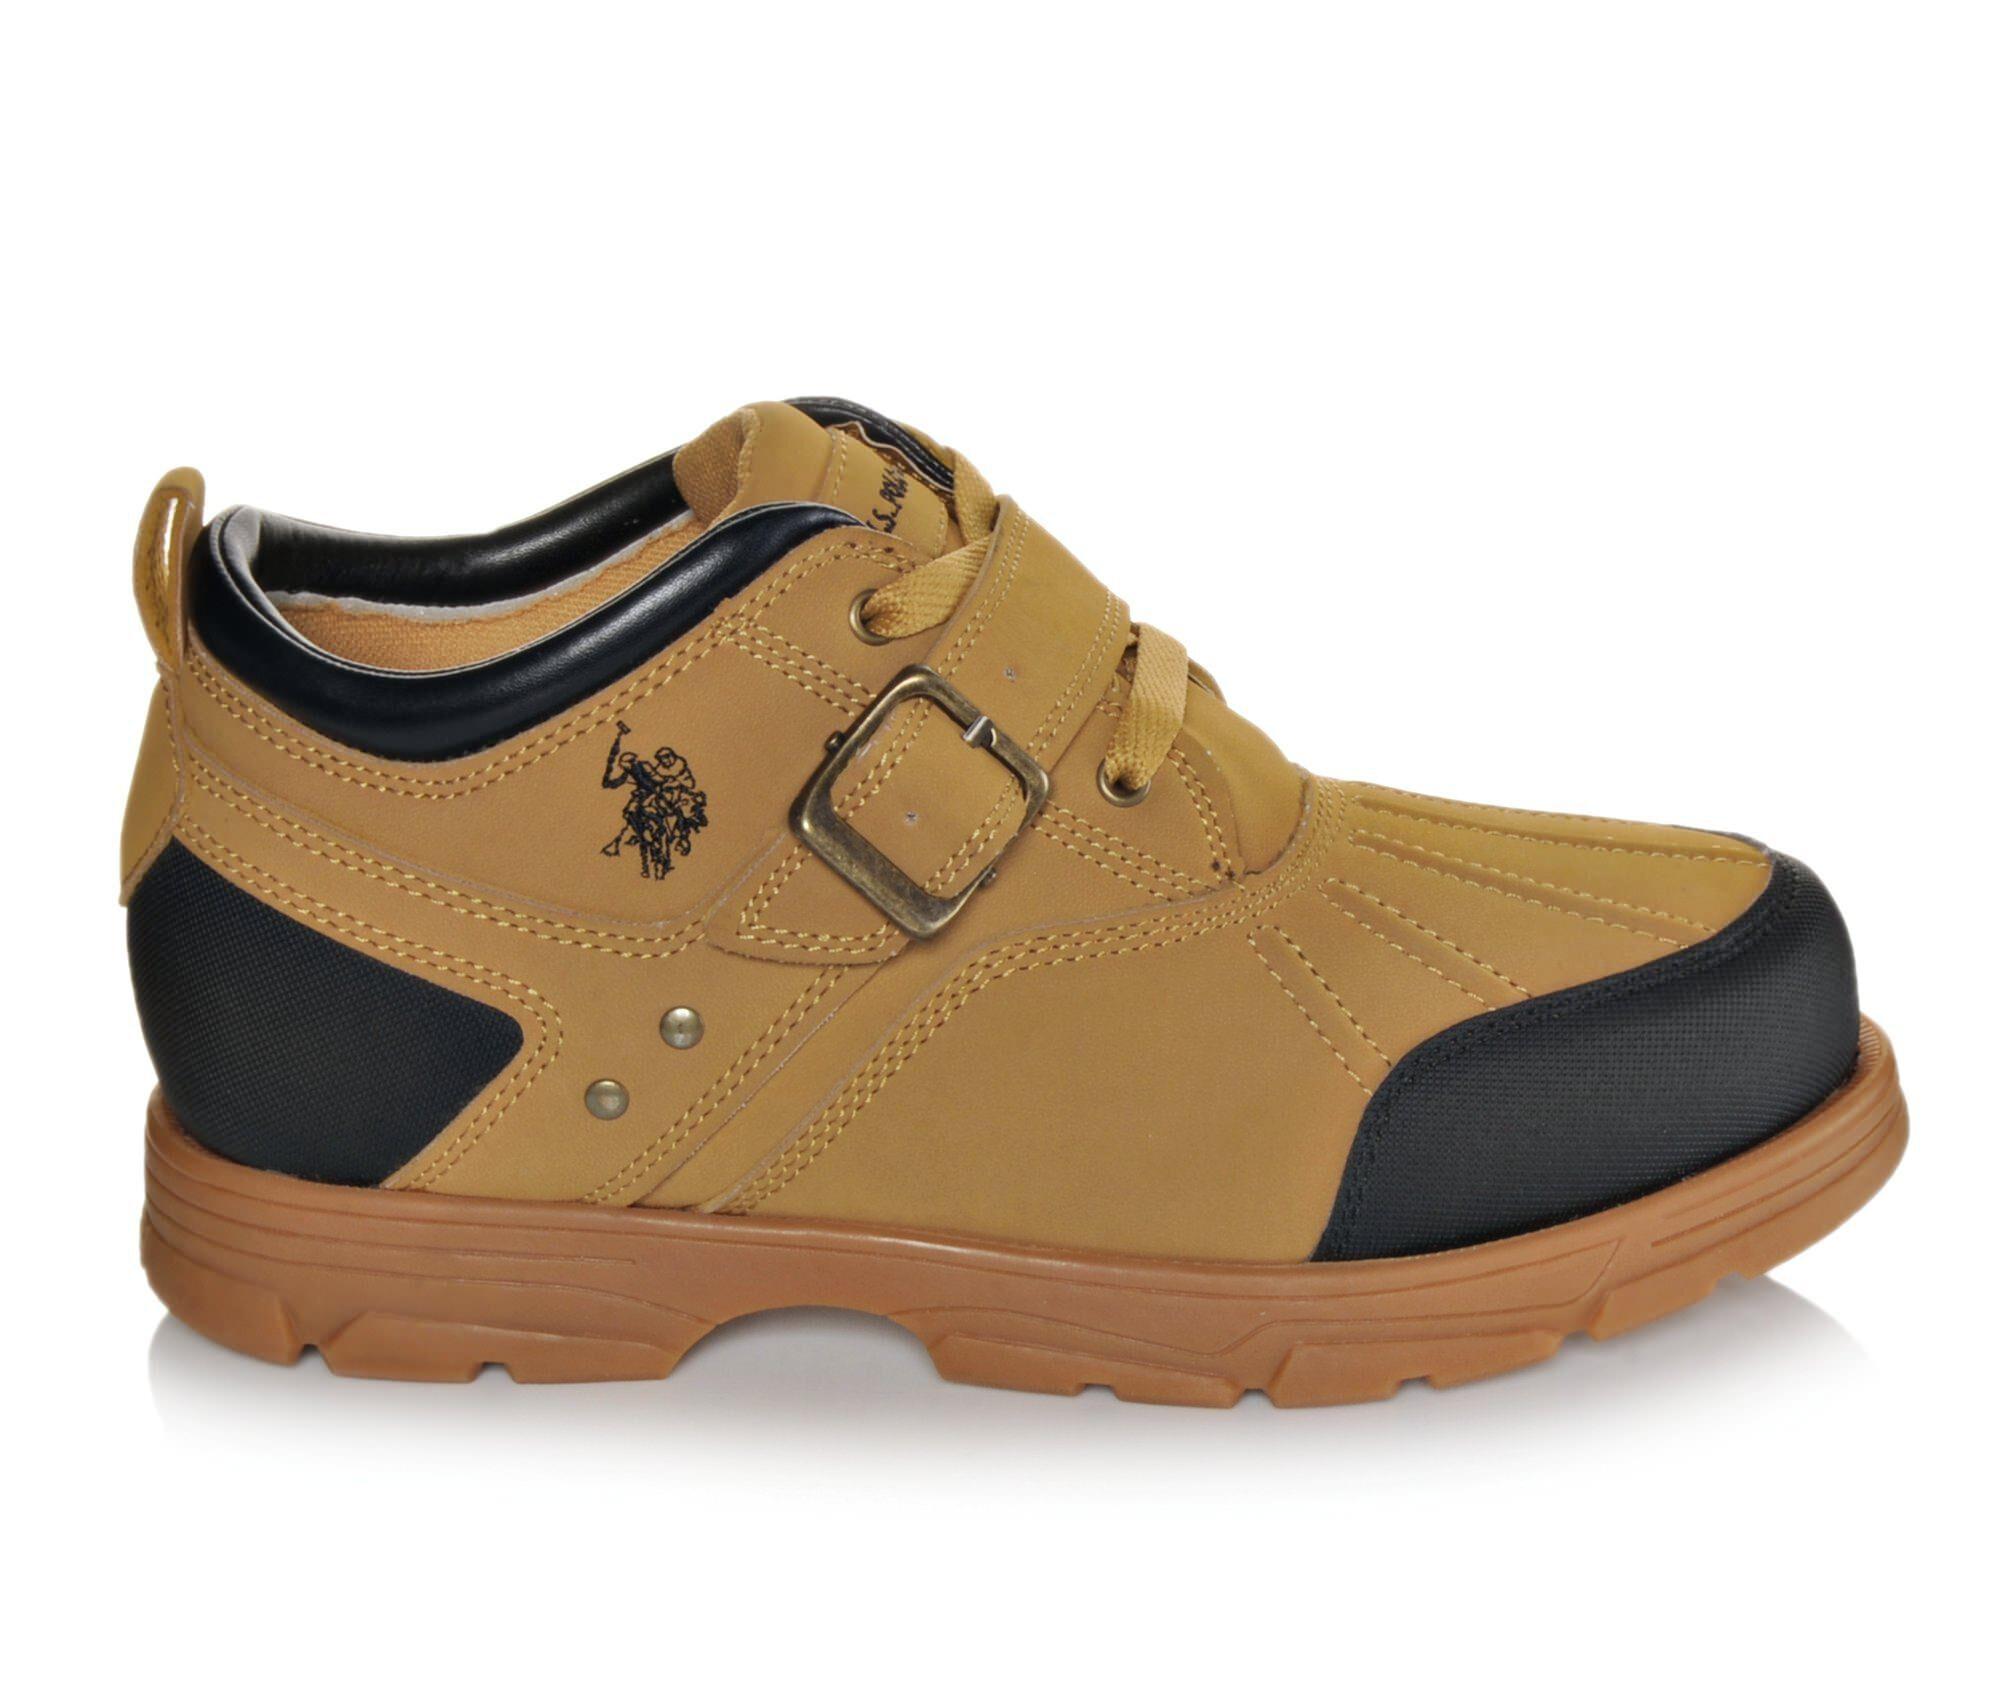 clearance Men's US Polo Assn Clancy II Boots Wheat Nubuck